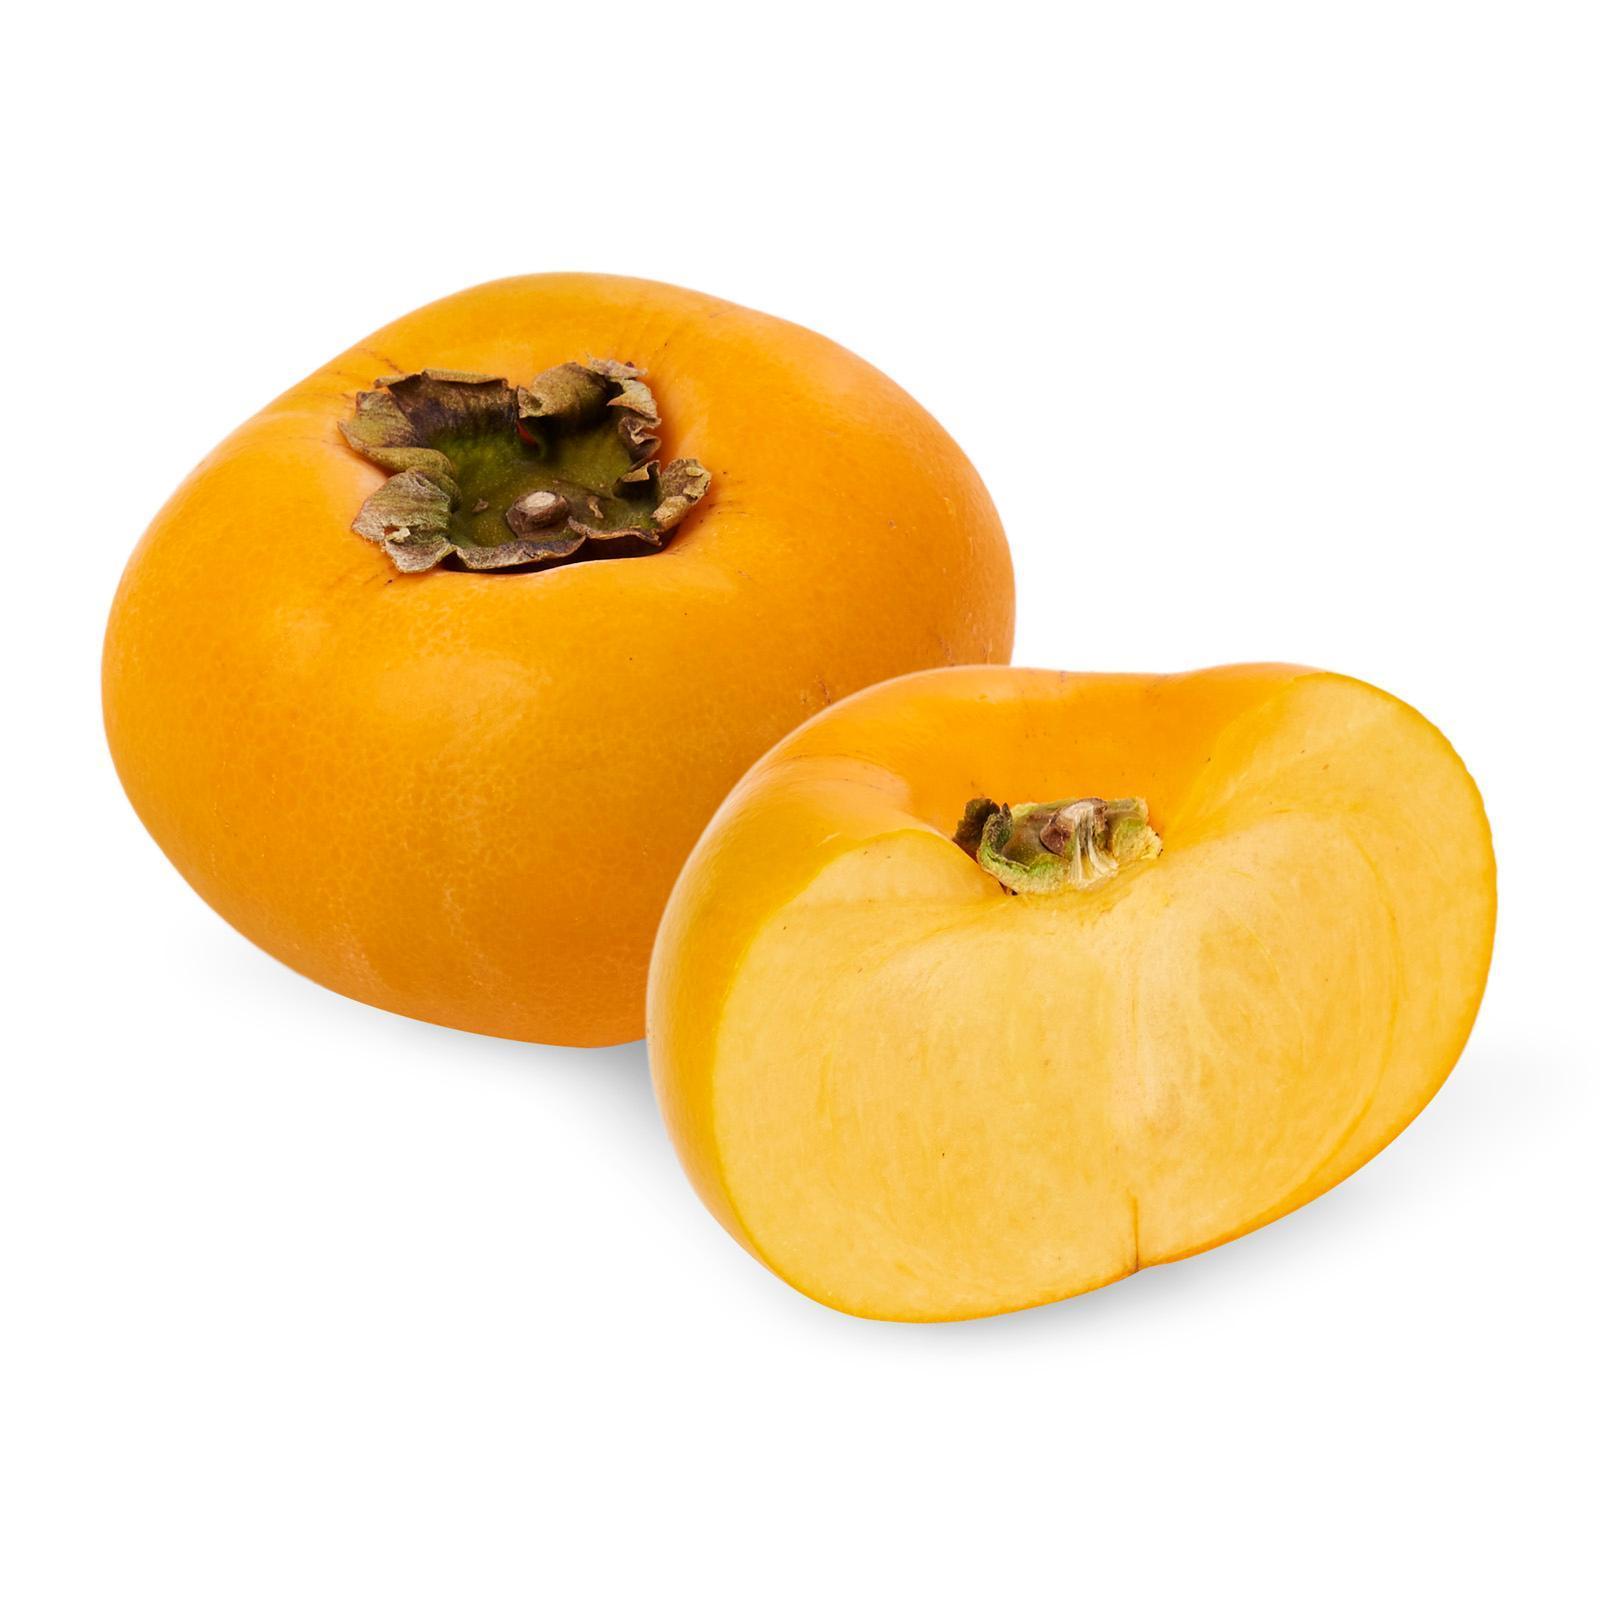 Kirei Japan Premium Fruits - Kaki Persimon Fruit (Orange Meat)